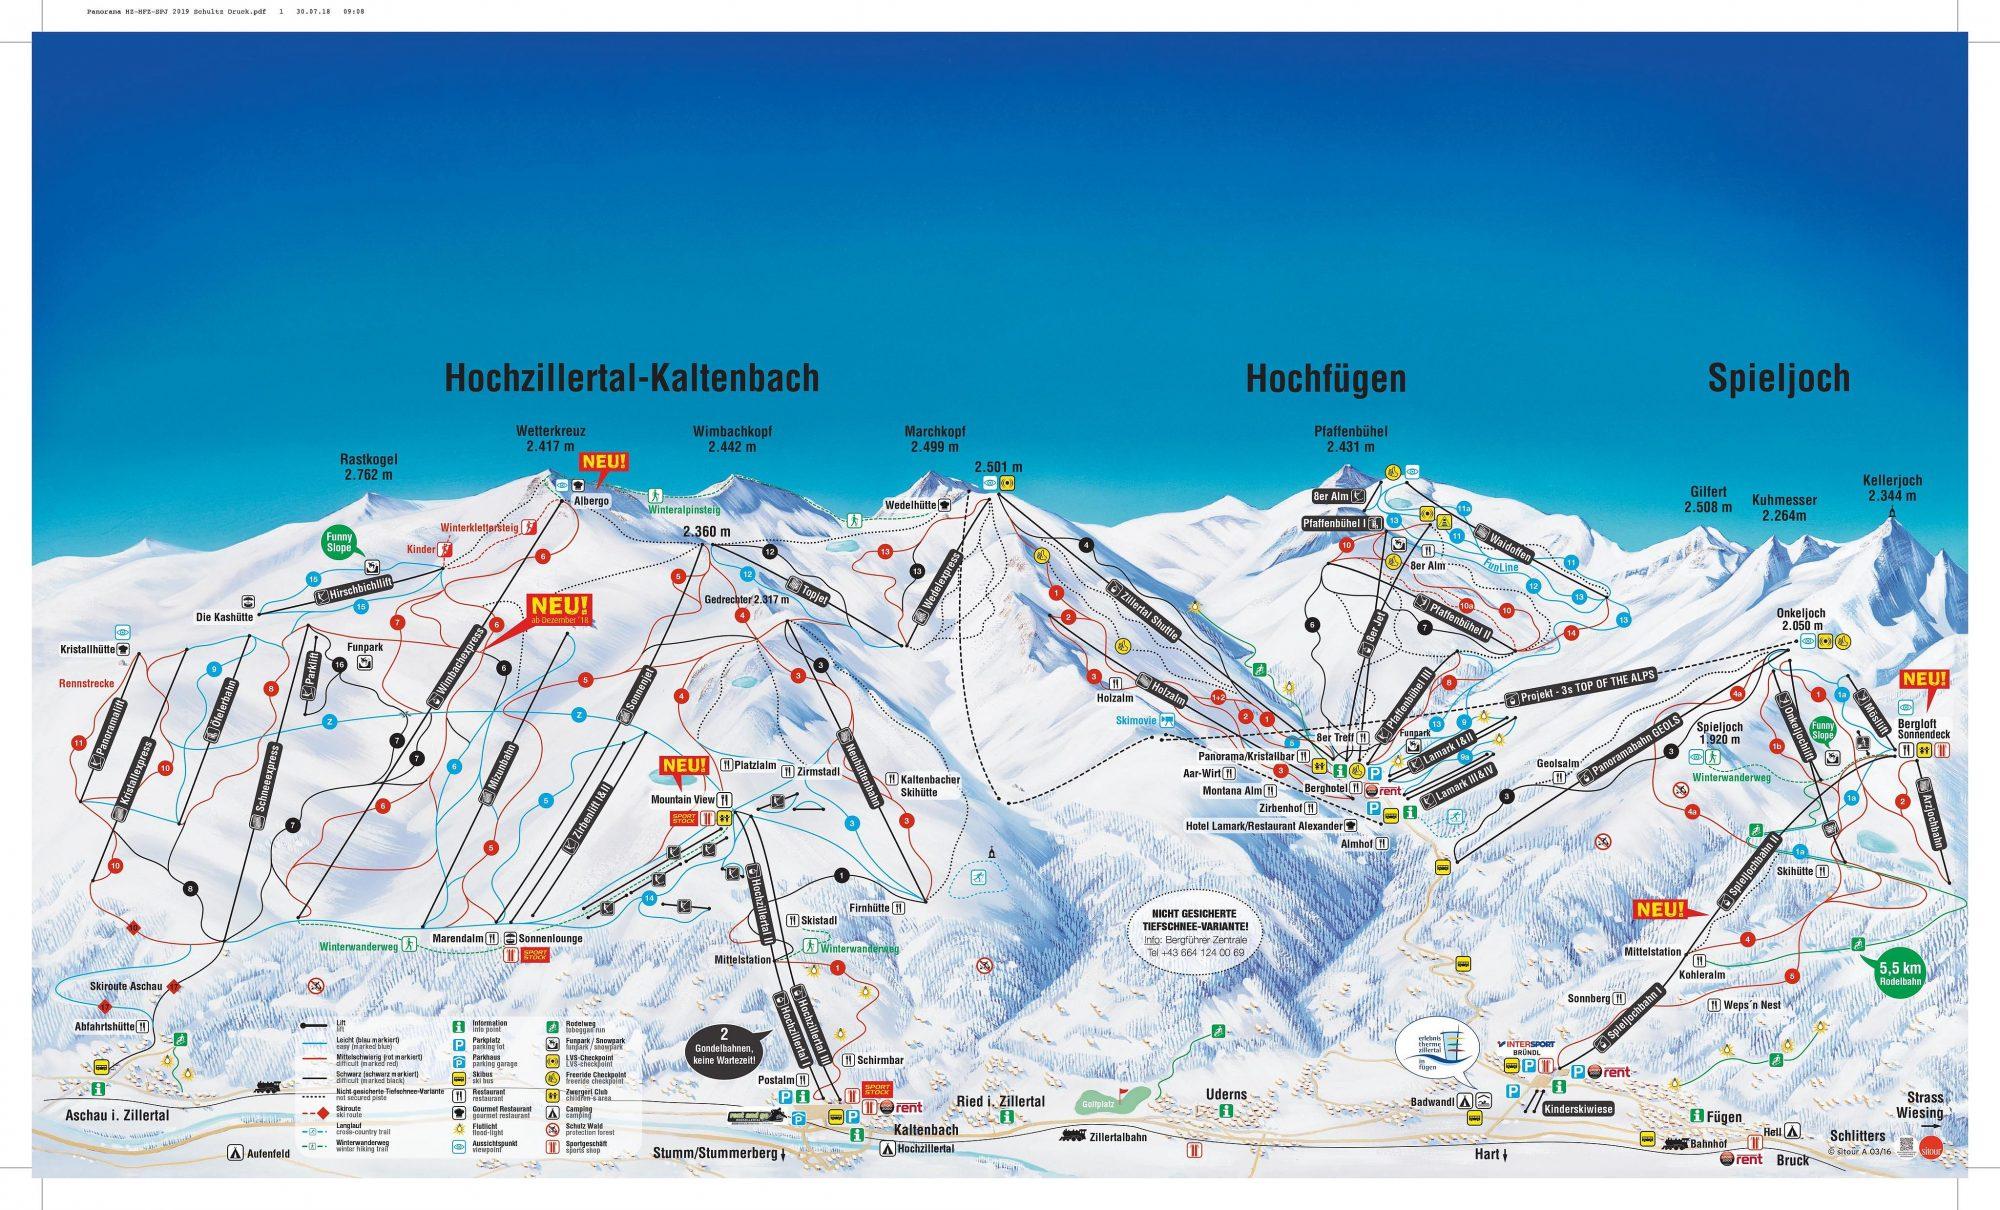 A Gondola Accident happened in Hochzillertal today. - The-Ski-Guru on